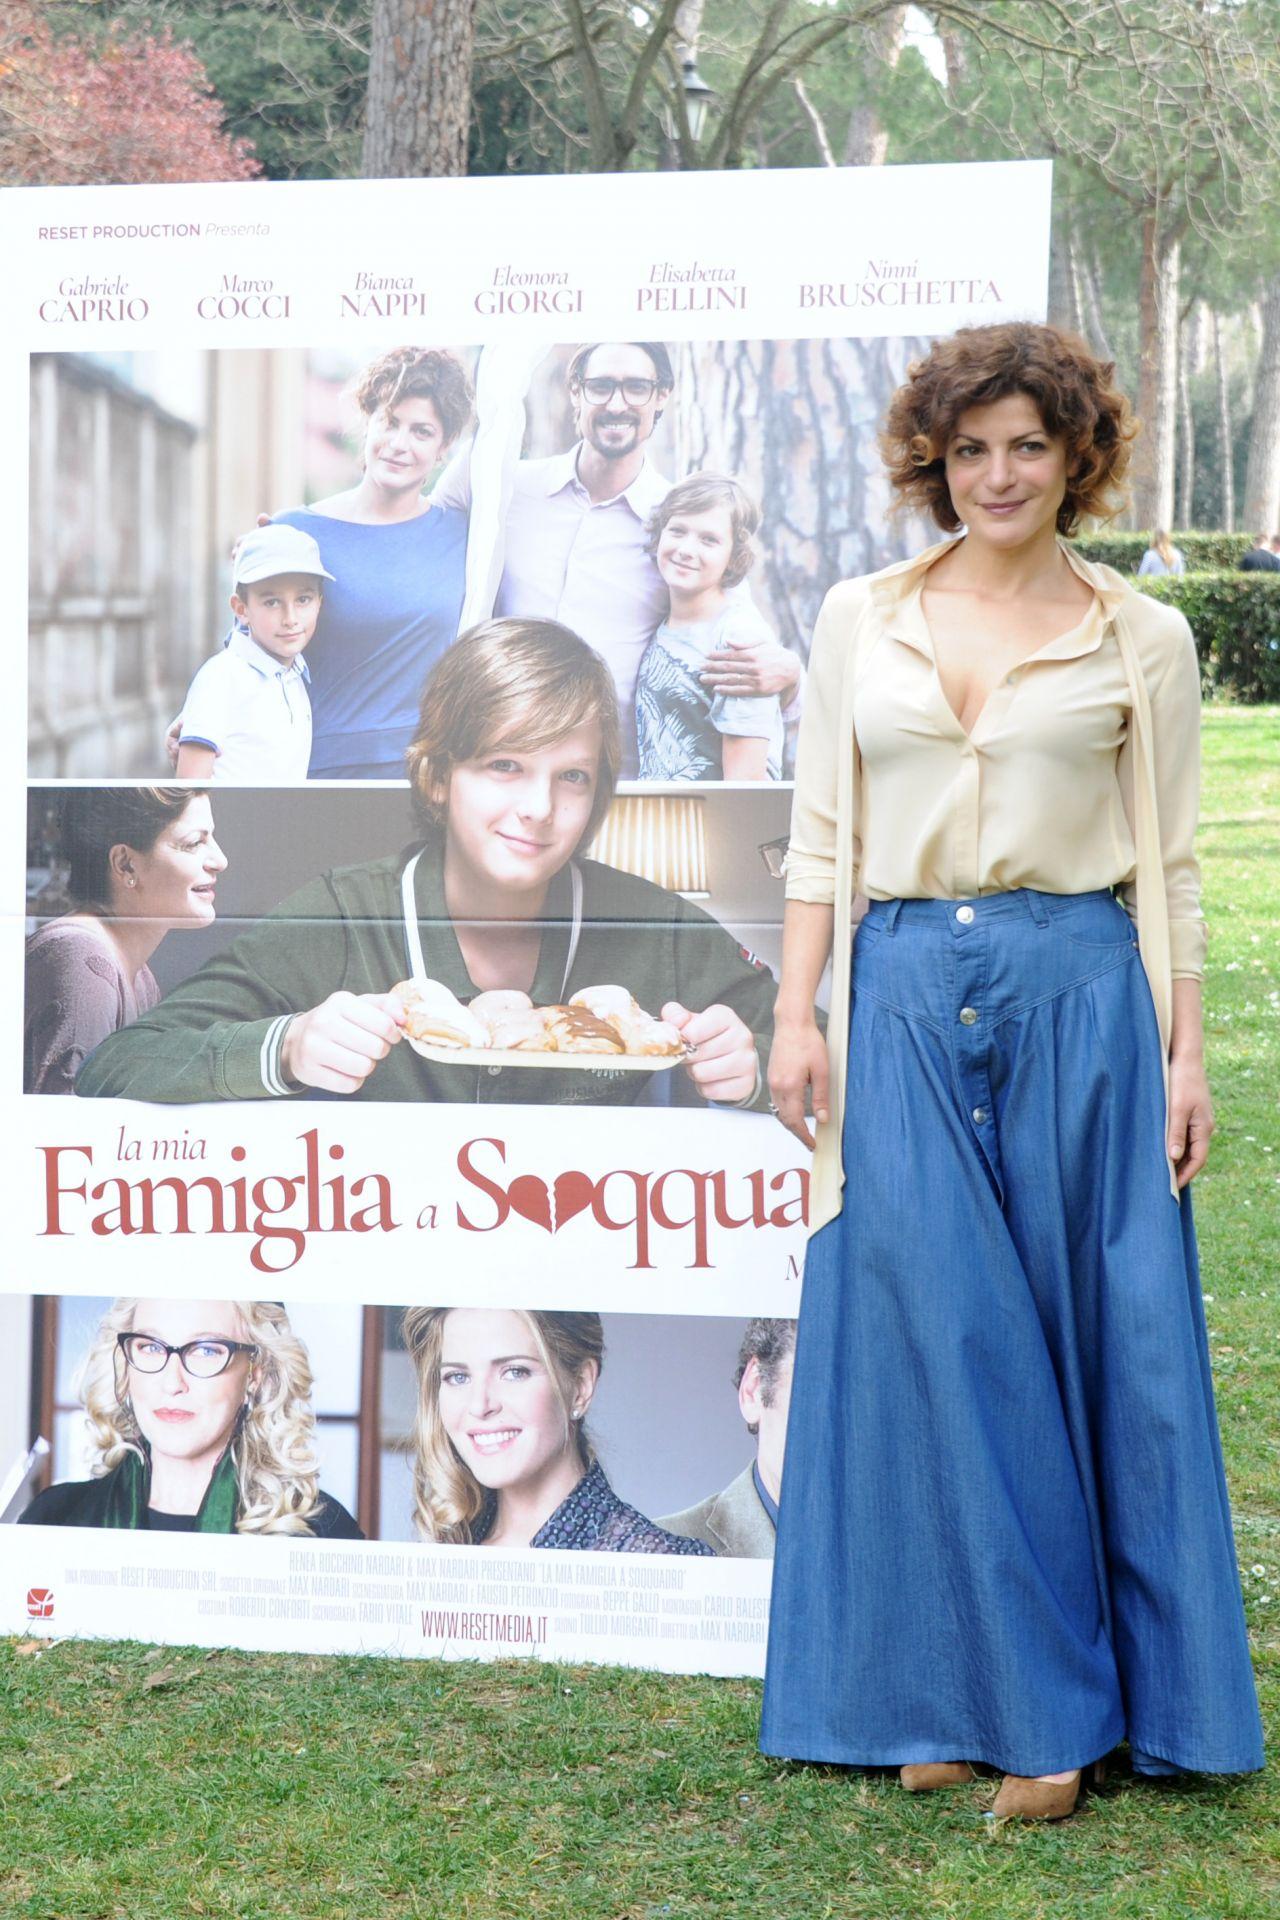 Bianca nappi la mia famiglia a soqquadro movie photocall in rome naked (45 photo), Hot Celebrity pics